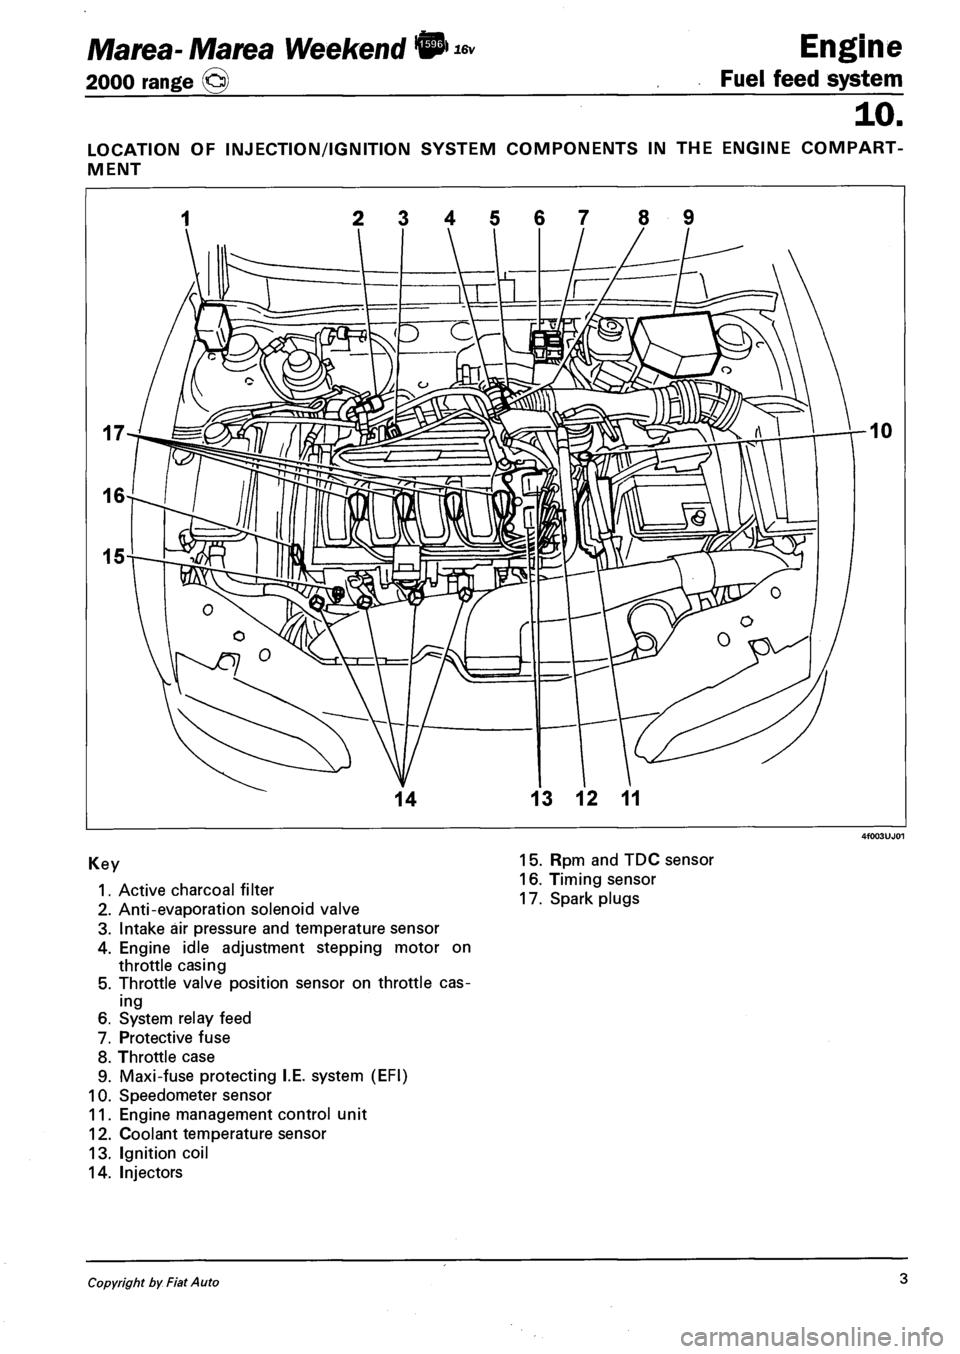 FIAT MAREA 2000 1.G Workshop Manual, Page 71